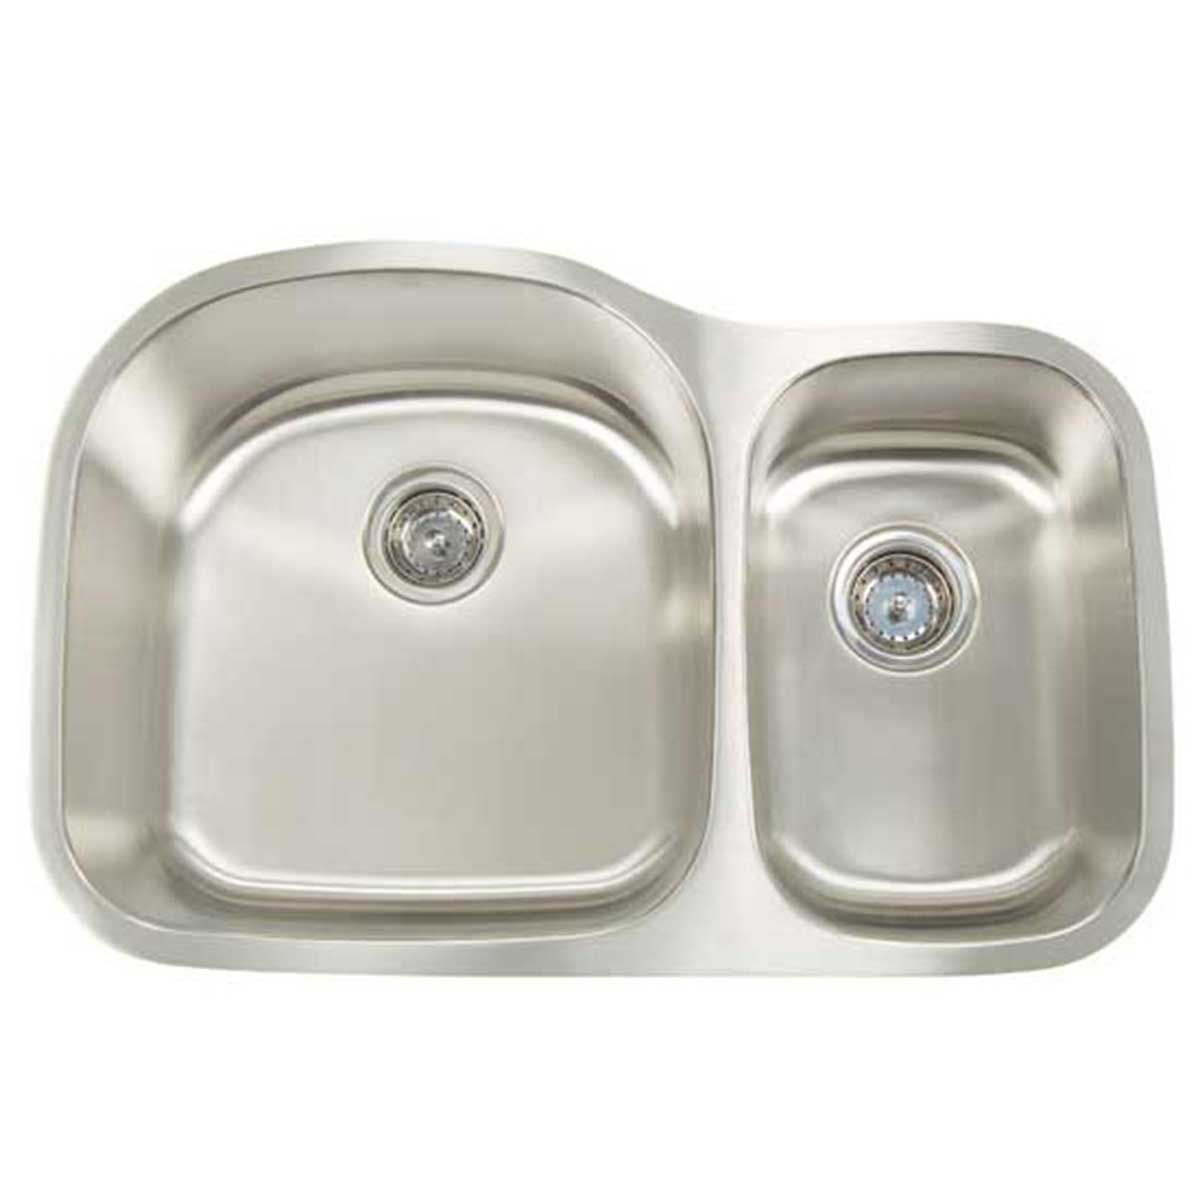 artisan reversed double bowl sink  artisan 16 gauge double bowl sink     artisan 16 gauge reversed double bowl  contractors direct   rh   contractorsdirect com